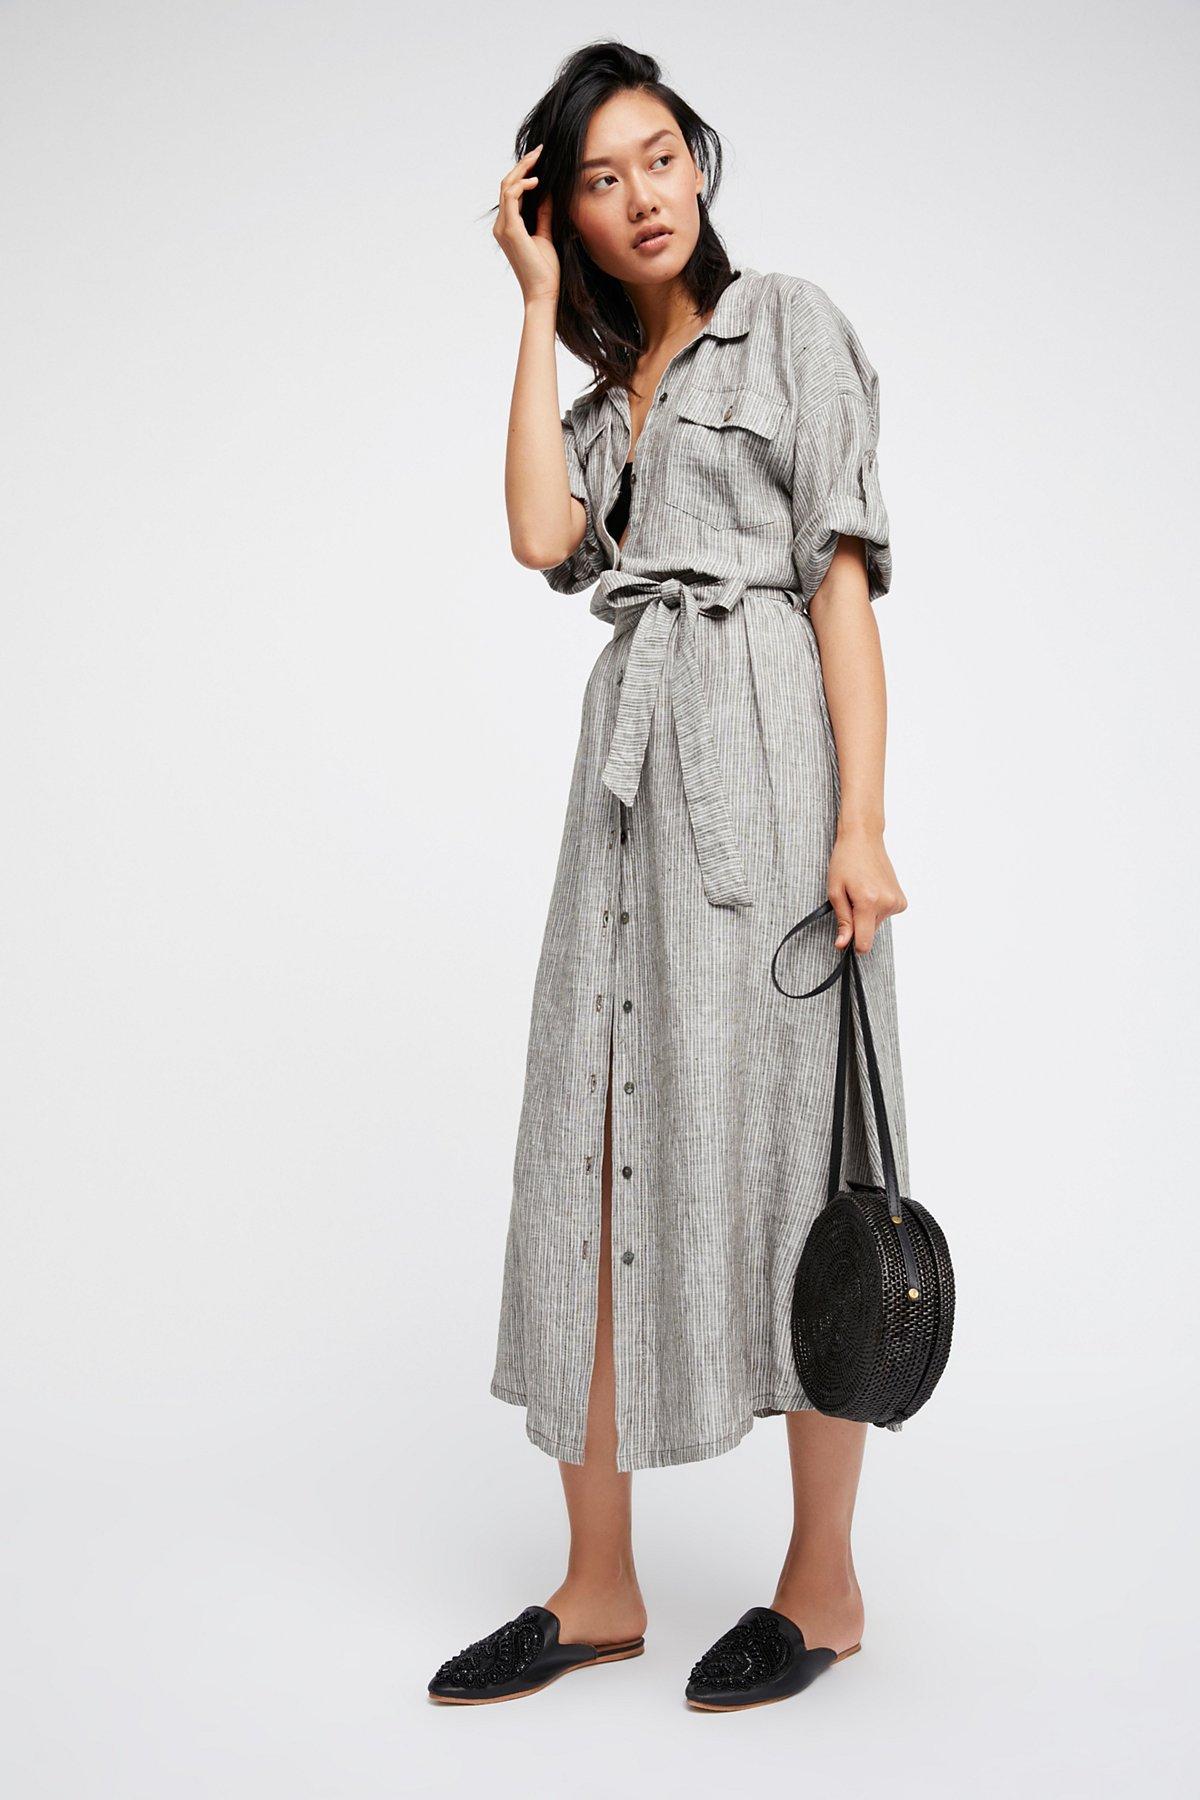 Cayman连衣裙